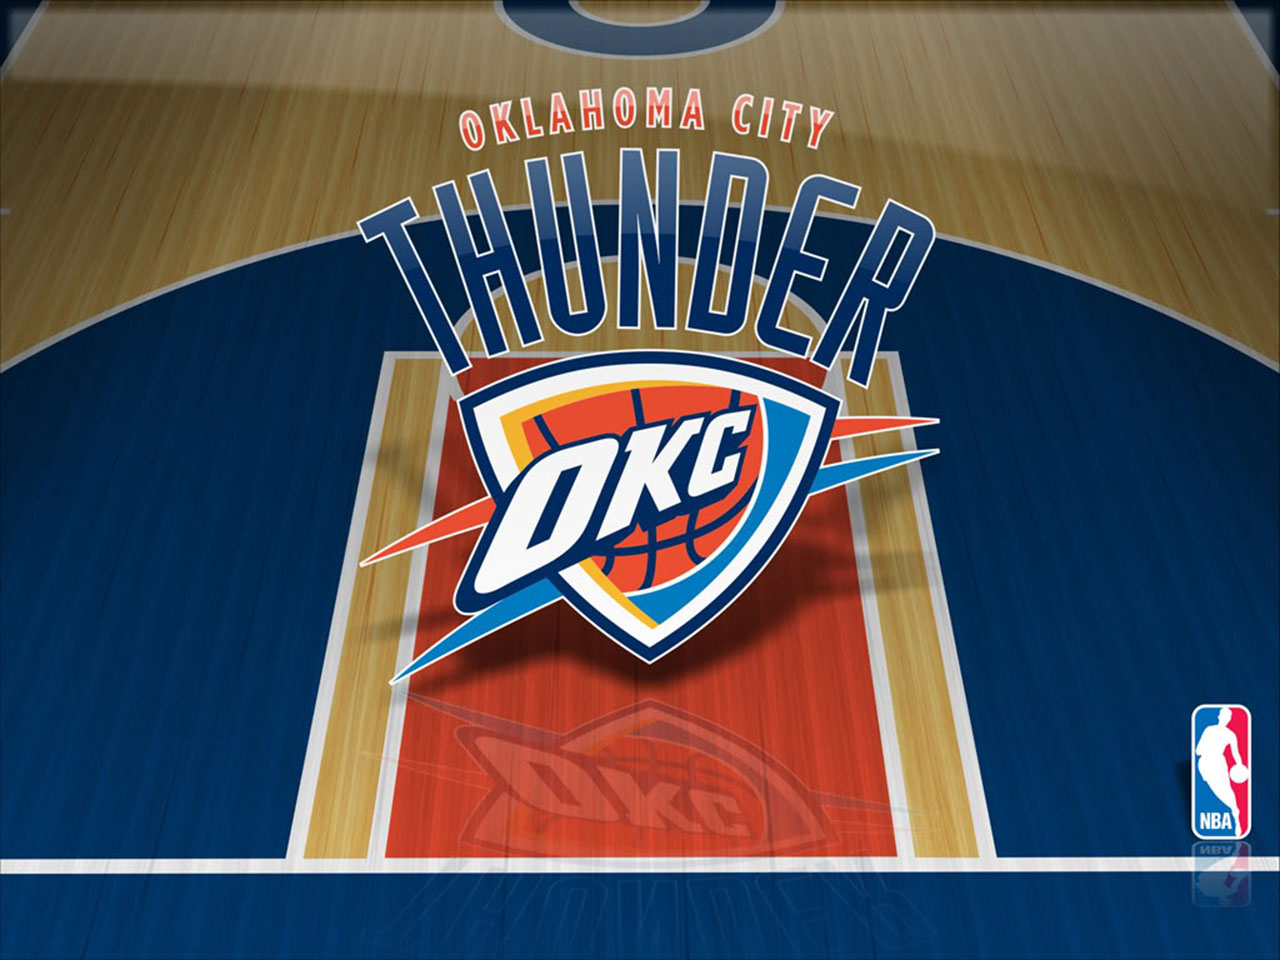 http://1.bp.blogspot.com/_FUqunw1CcGY/TQ5P8jQKGUI/AAAAAAAAAhk/AIWVpv64H78/s1600/Oklahoma-City-Thunder-Court-Wallpaper.jpg